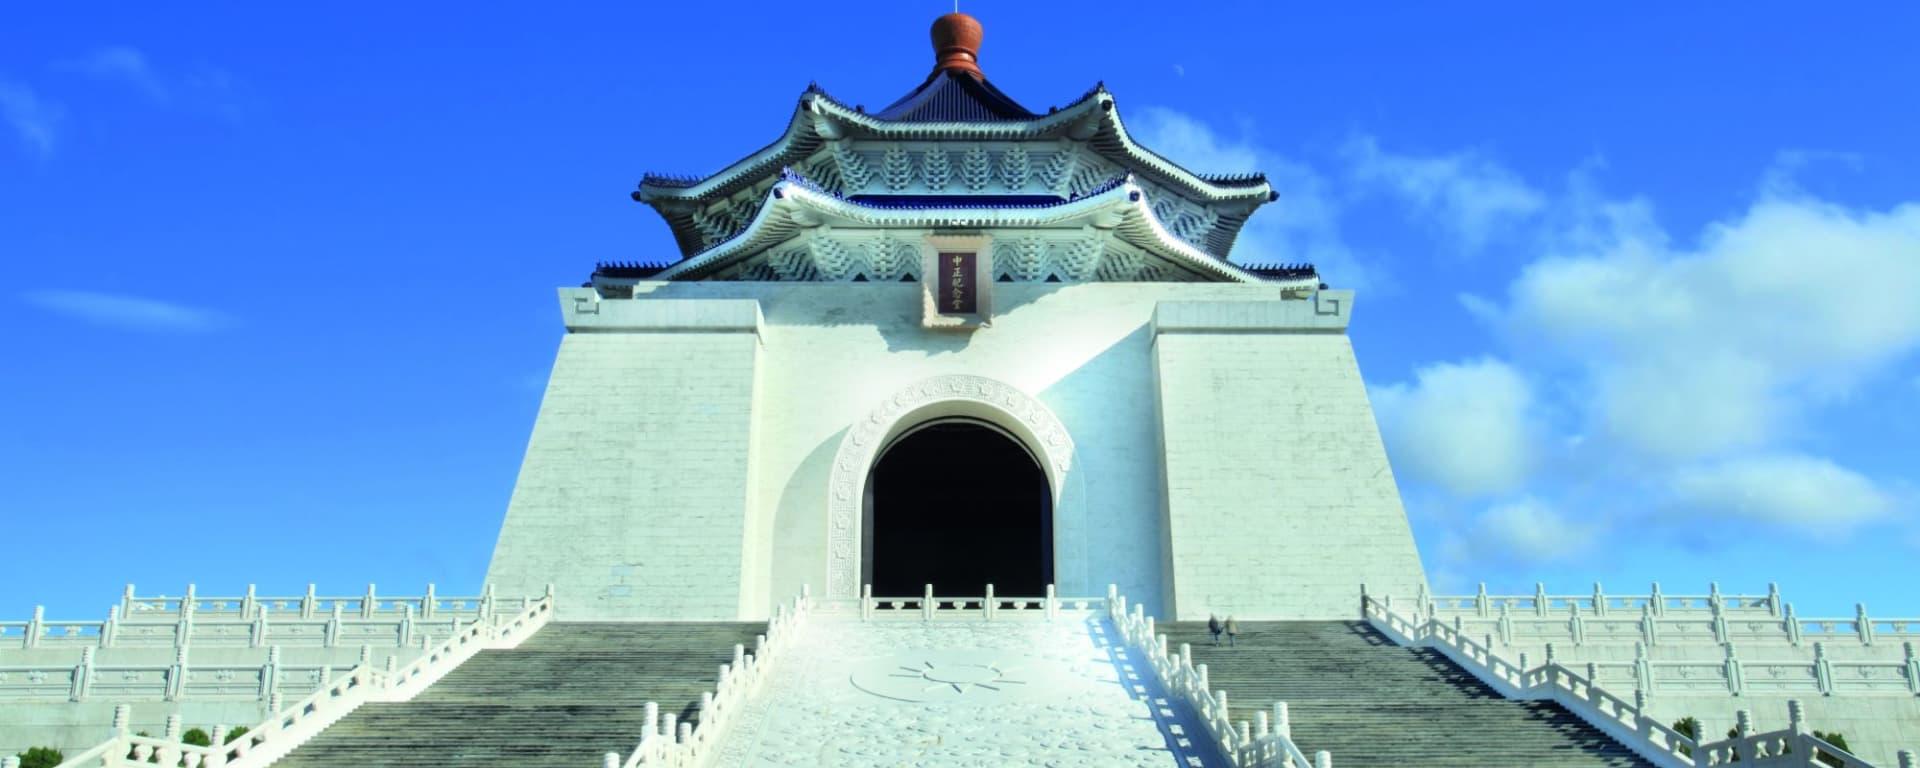 Tour de ville de Taipei: Taipei Chiang Kai-Shek Memorial Hall